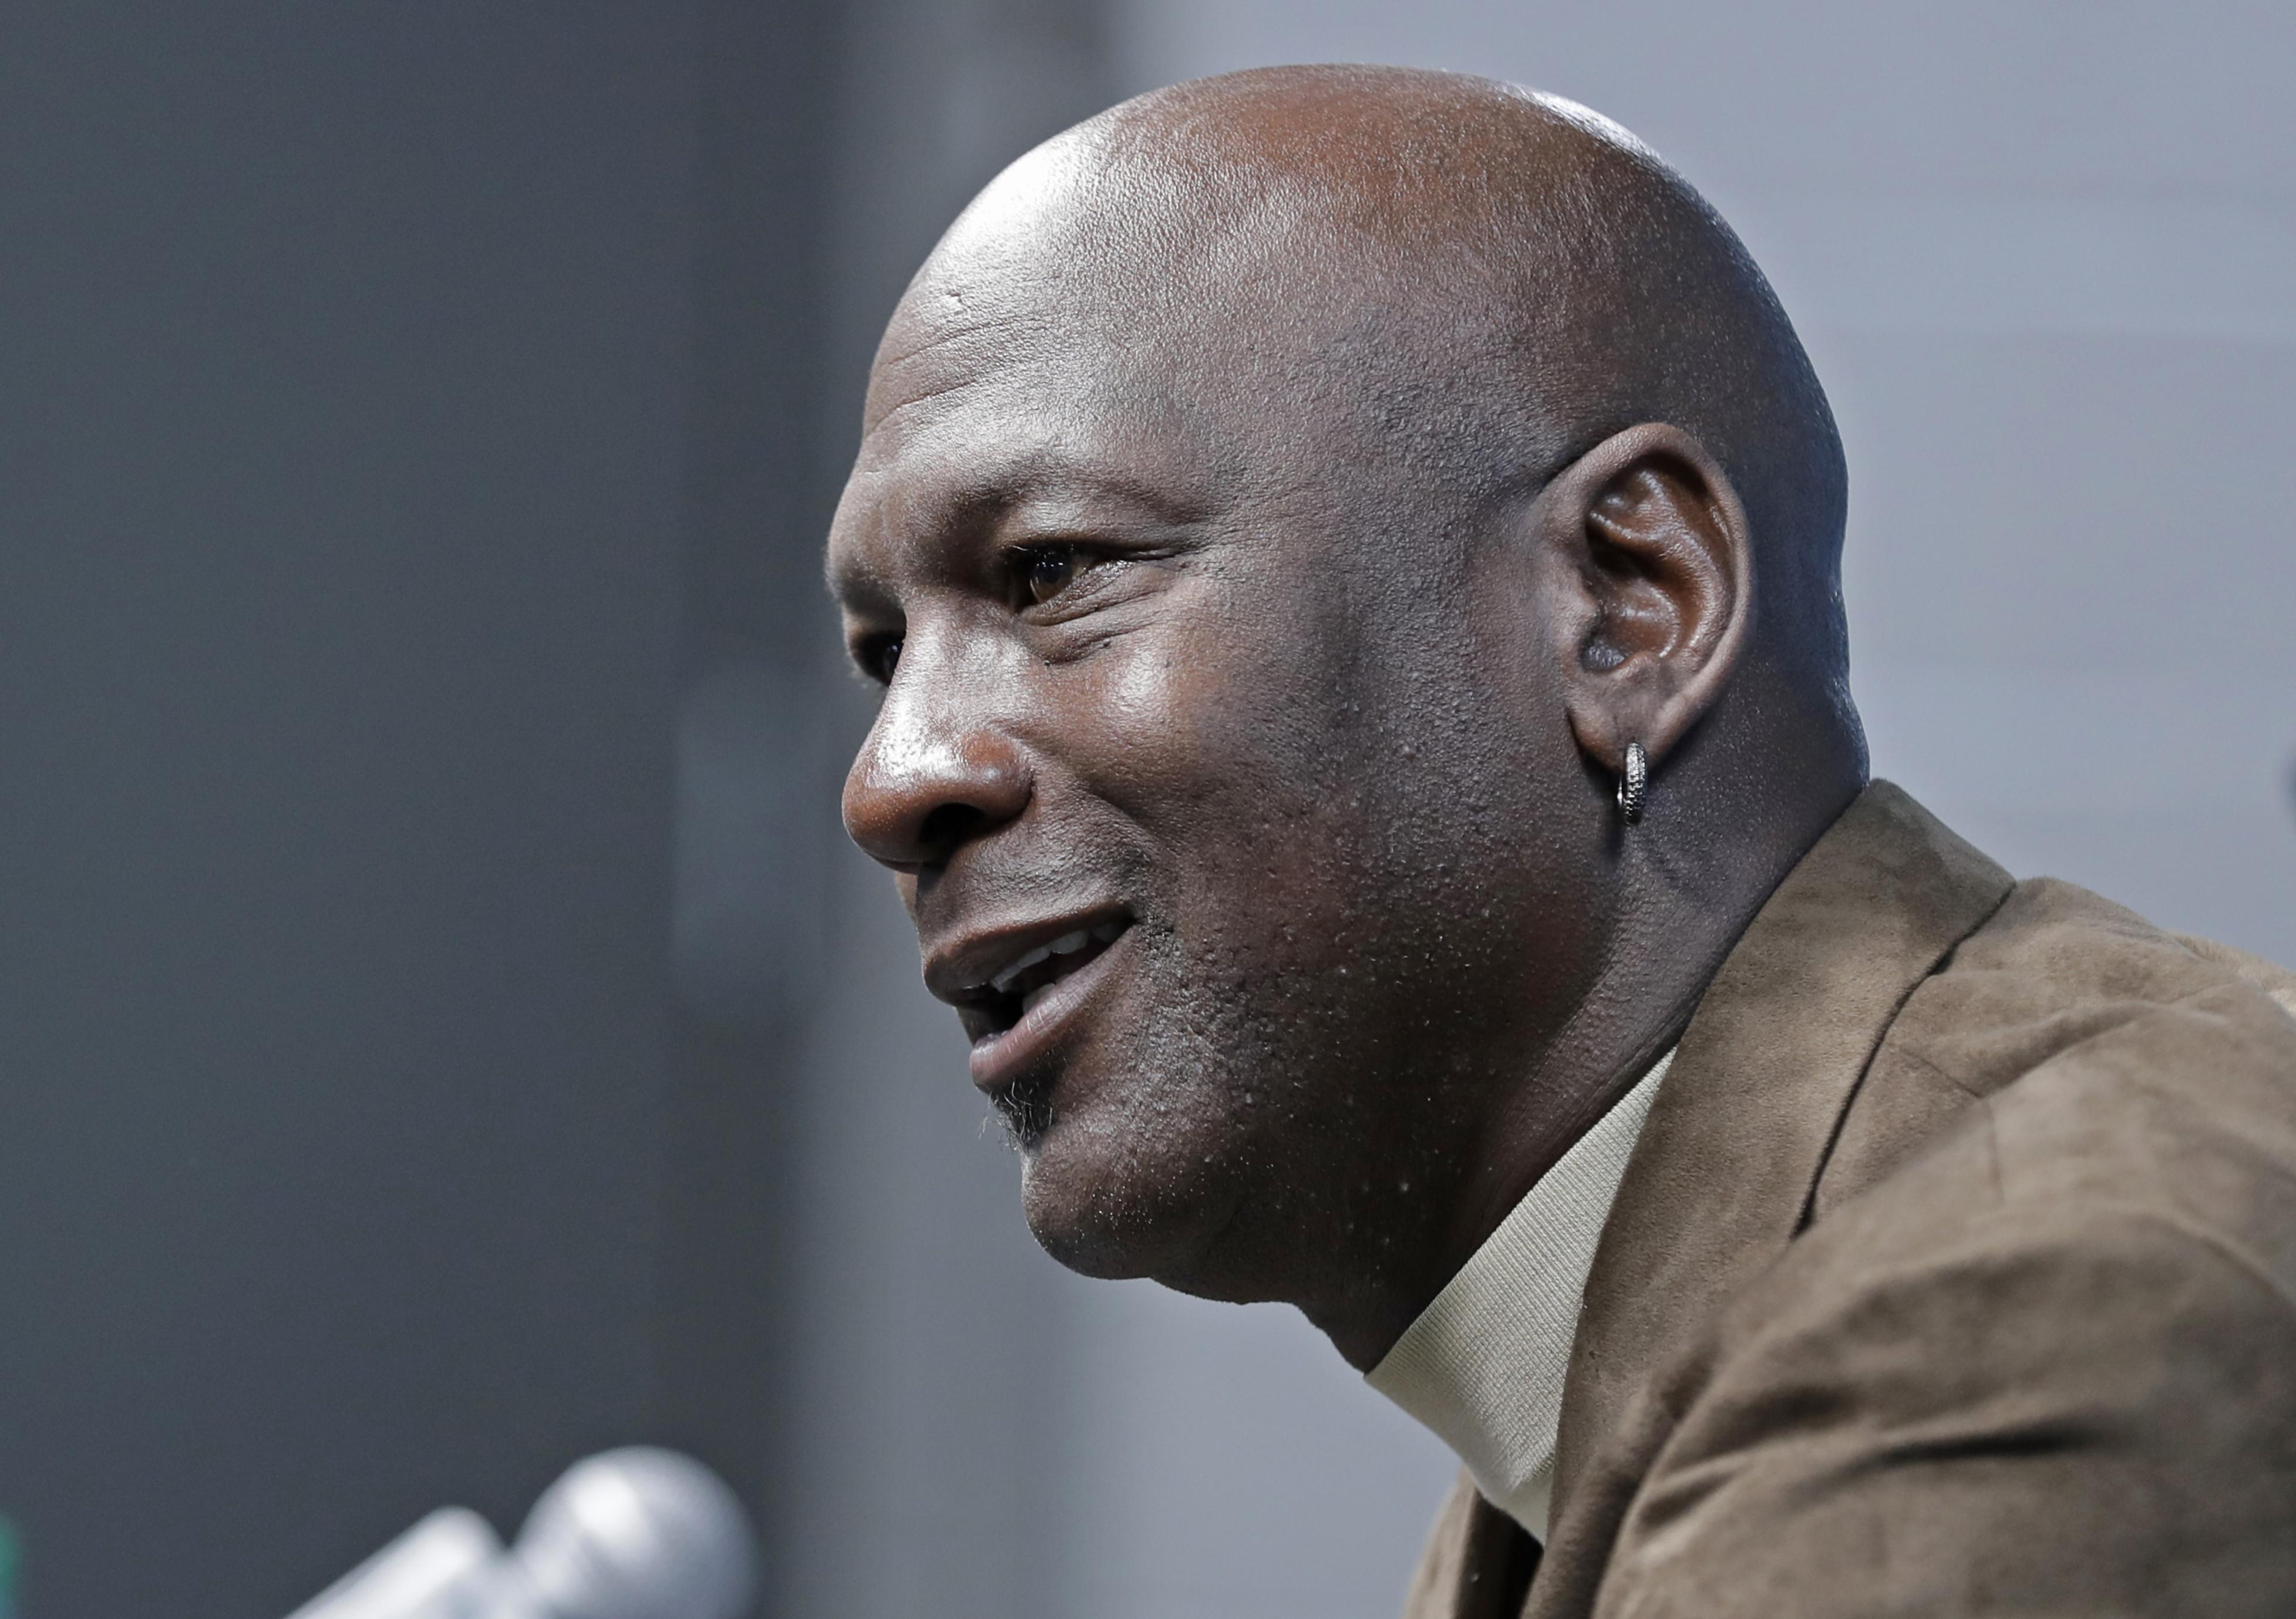 High court won't referee dispute over Michael Jordan images